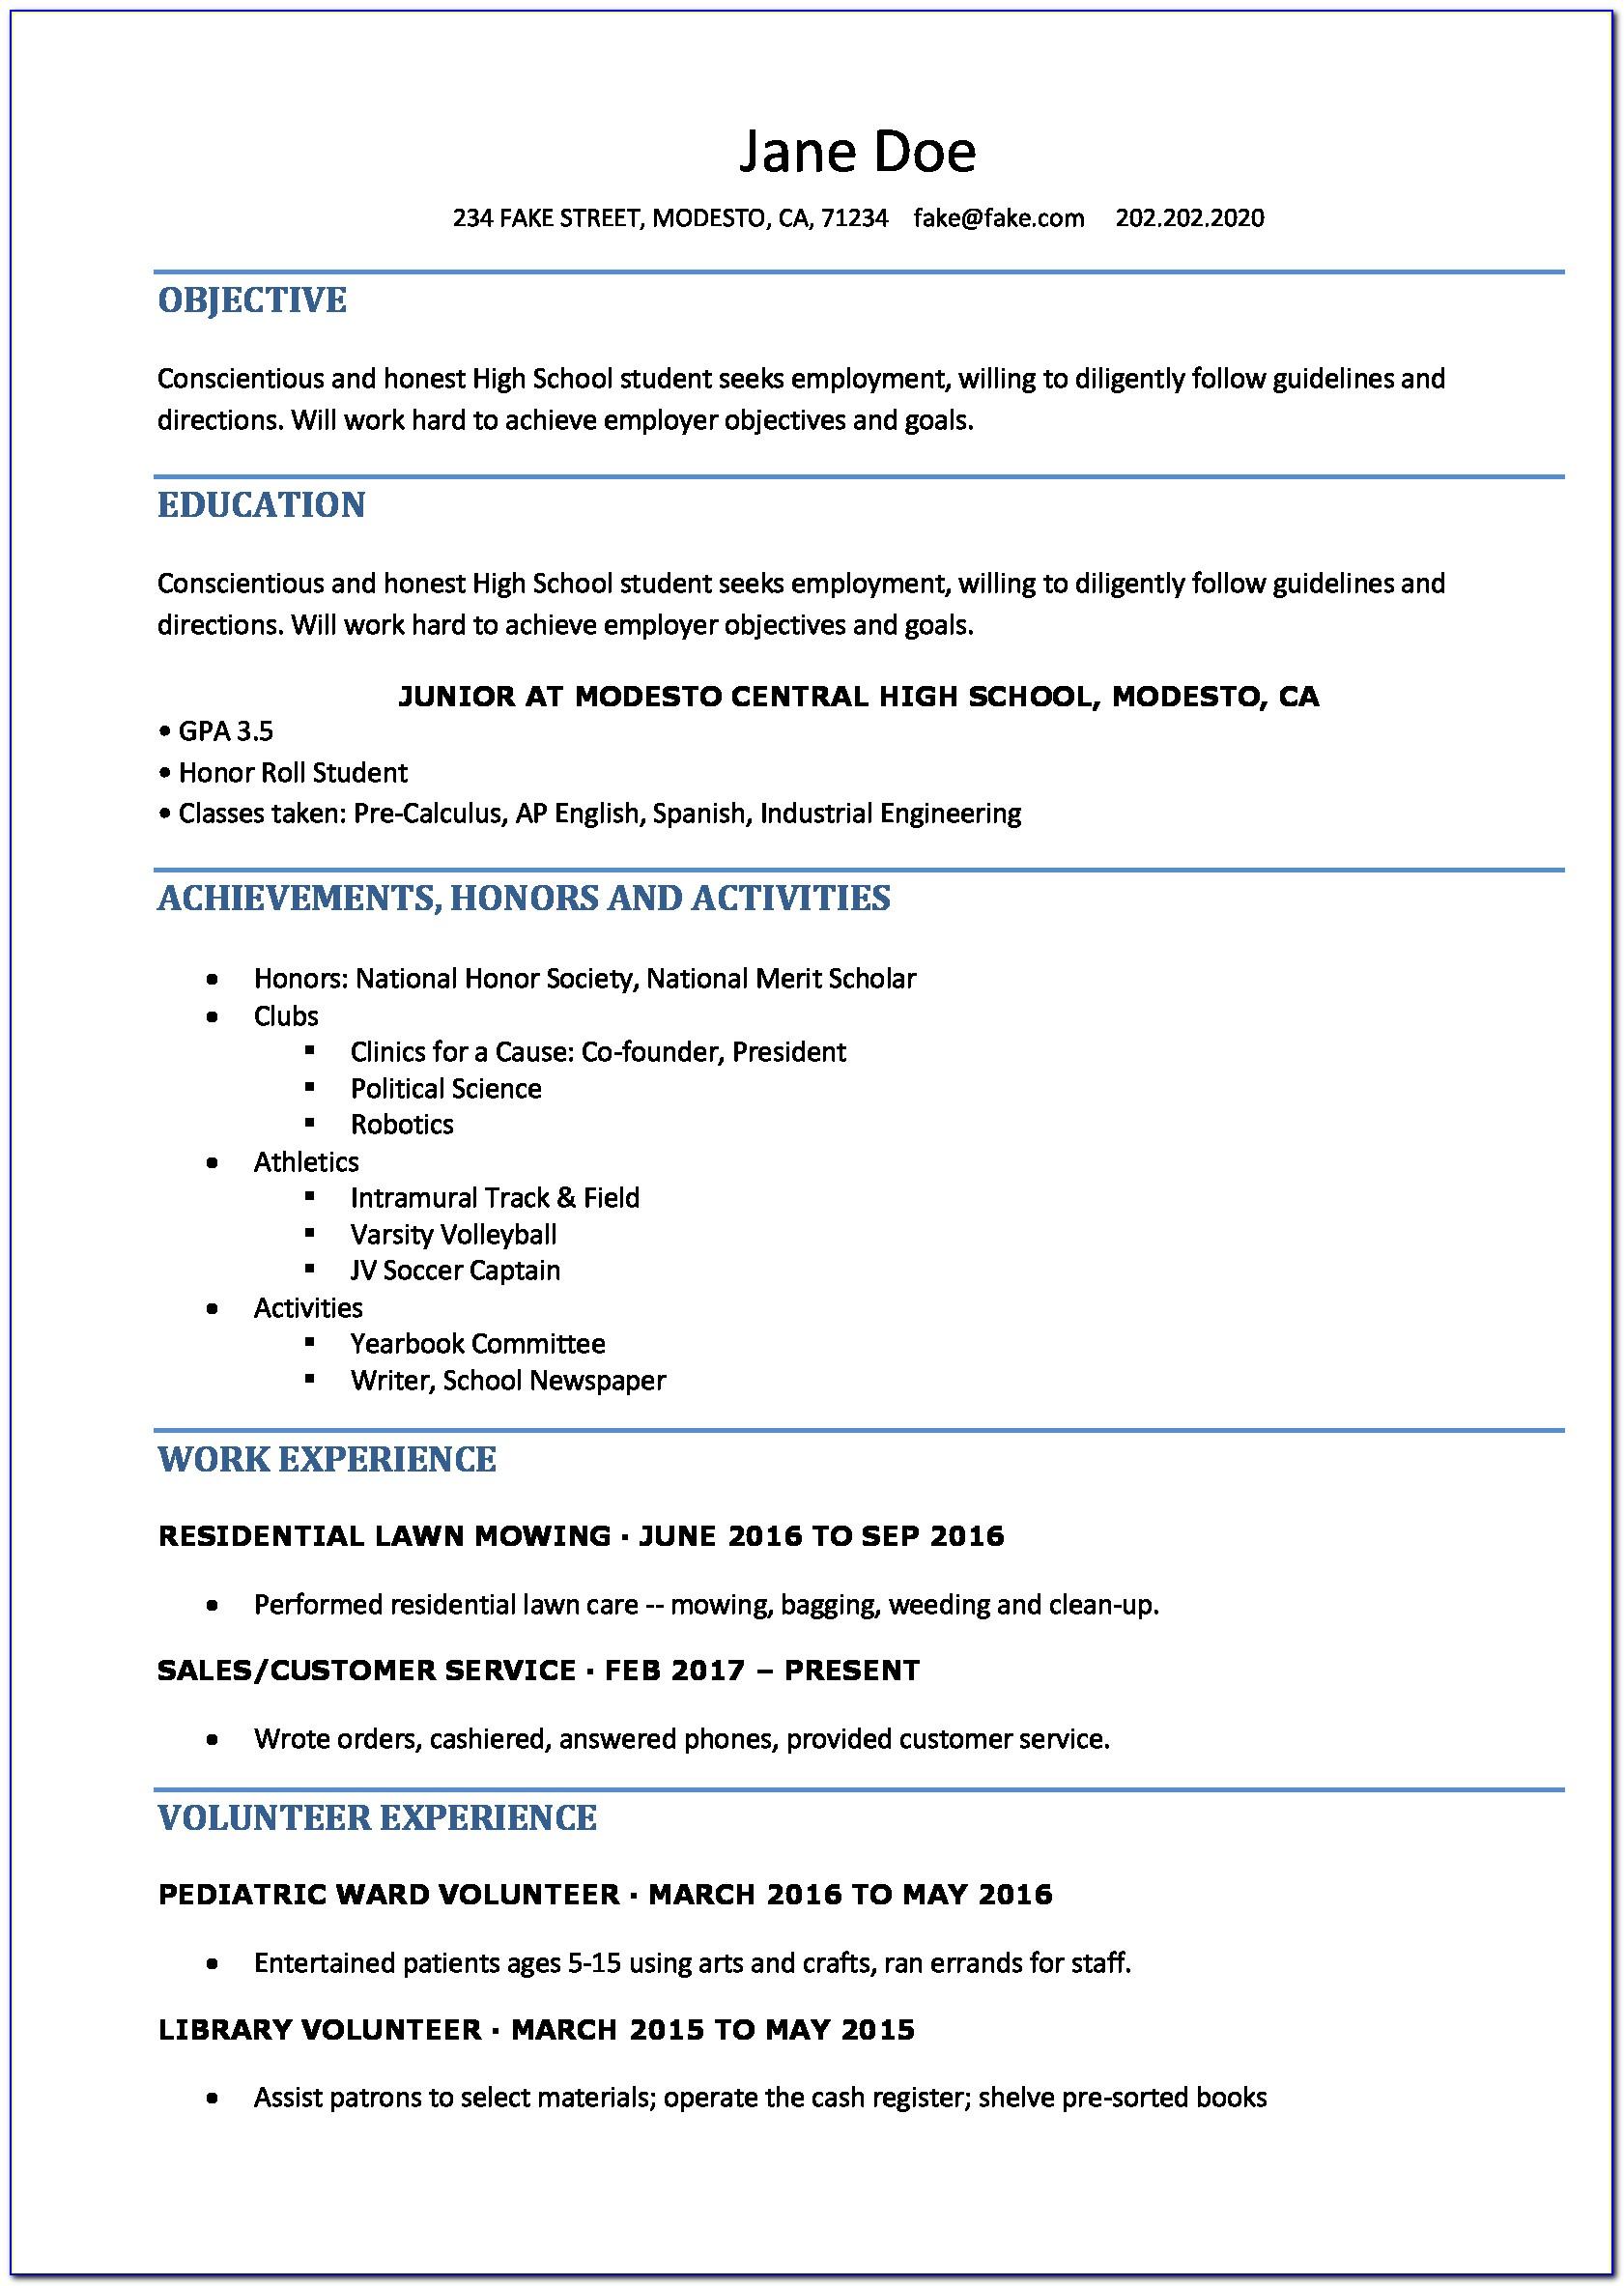 Resume Template For High School Student Internship